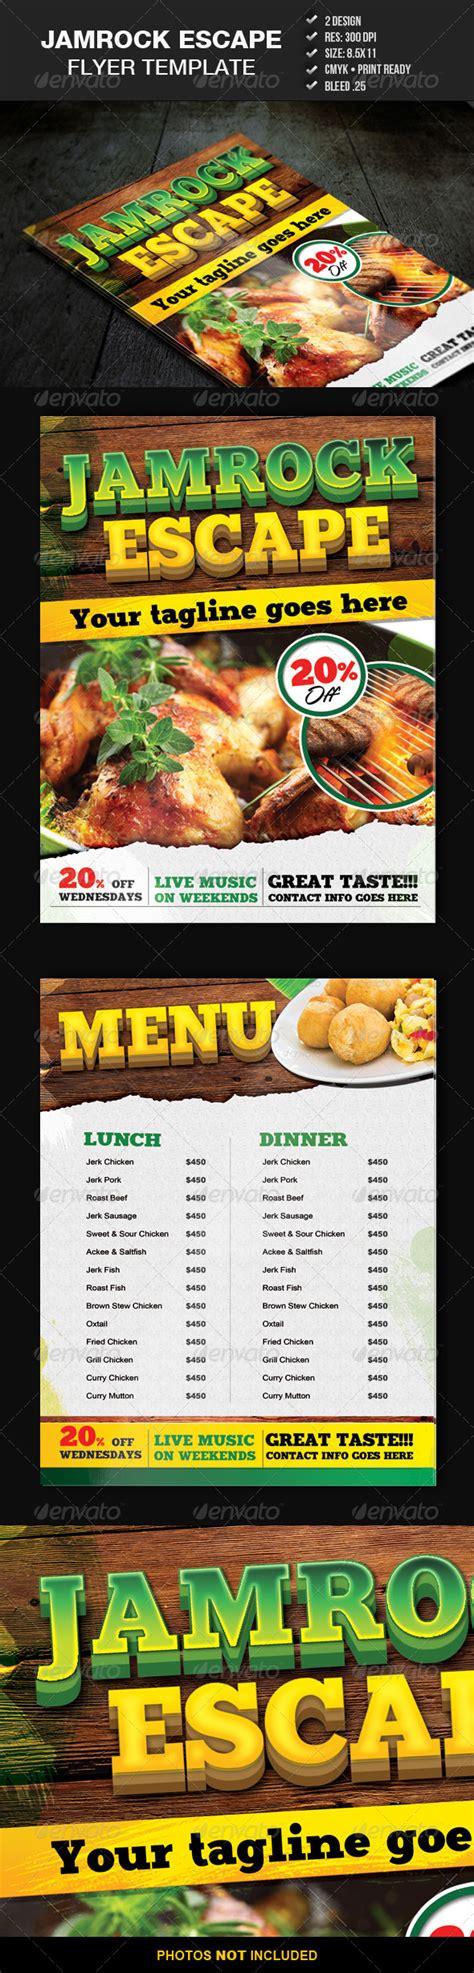 Free Jamaican Food Flyer Template 187 Dondrup Com Free Caribbean Menu Template